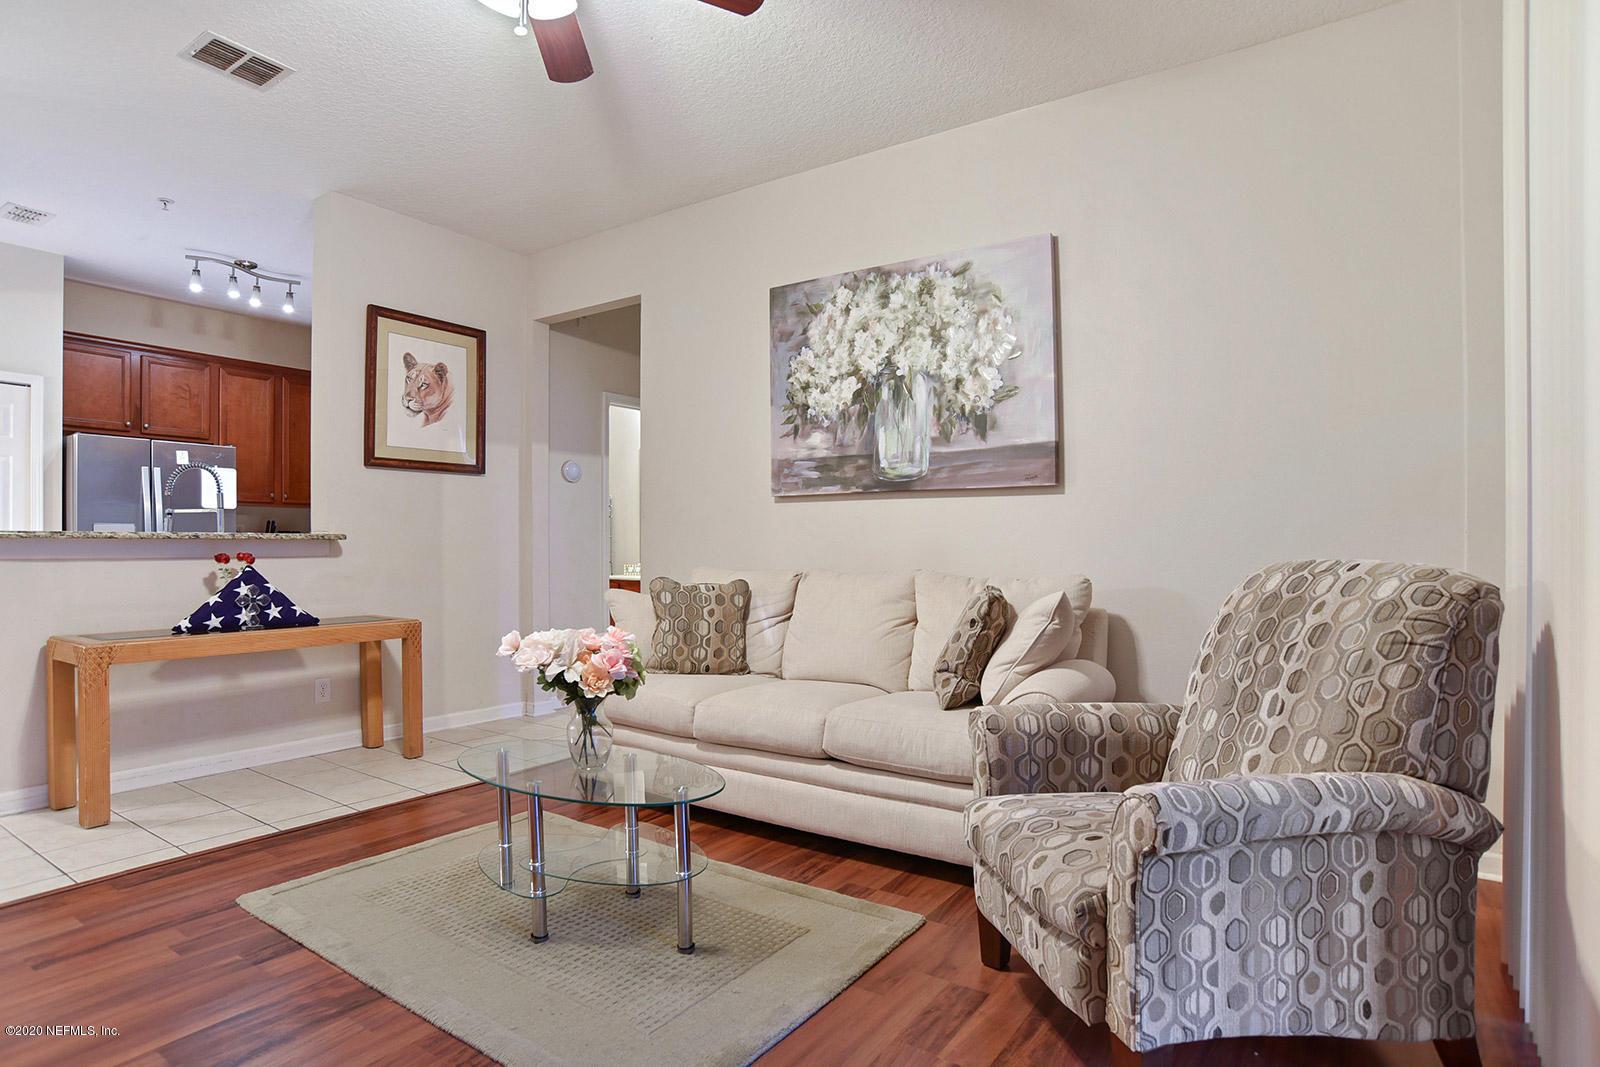 8601 BEACH, JACKSONVILLE, FLORIDA 32216, 3 Bedrooms Bedrooms, ,2 BathroomsBathrooms,Residential,For sale,BEACH,1081834